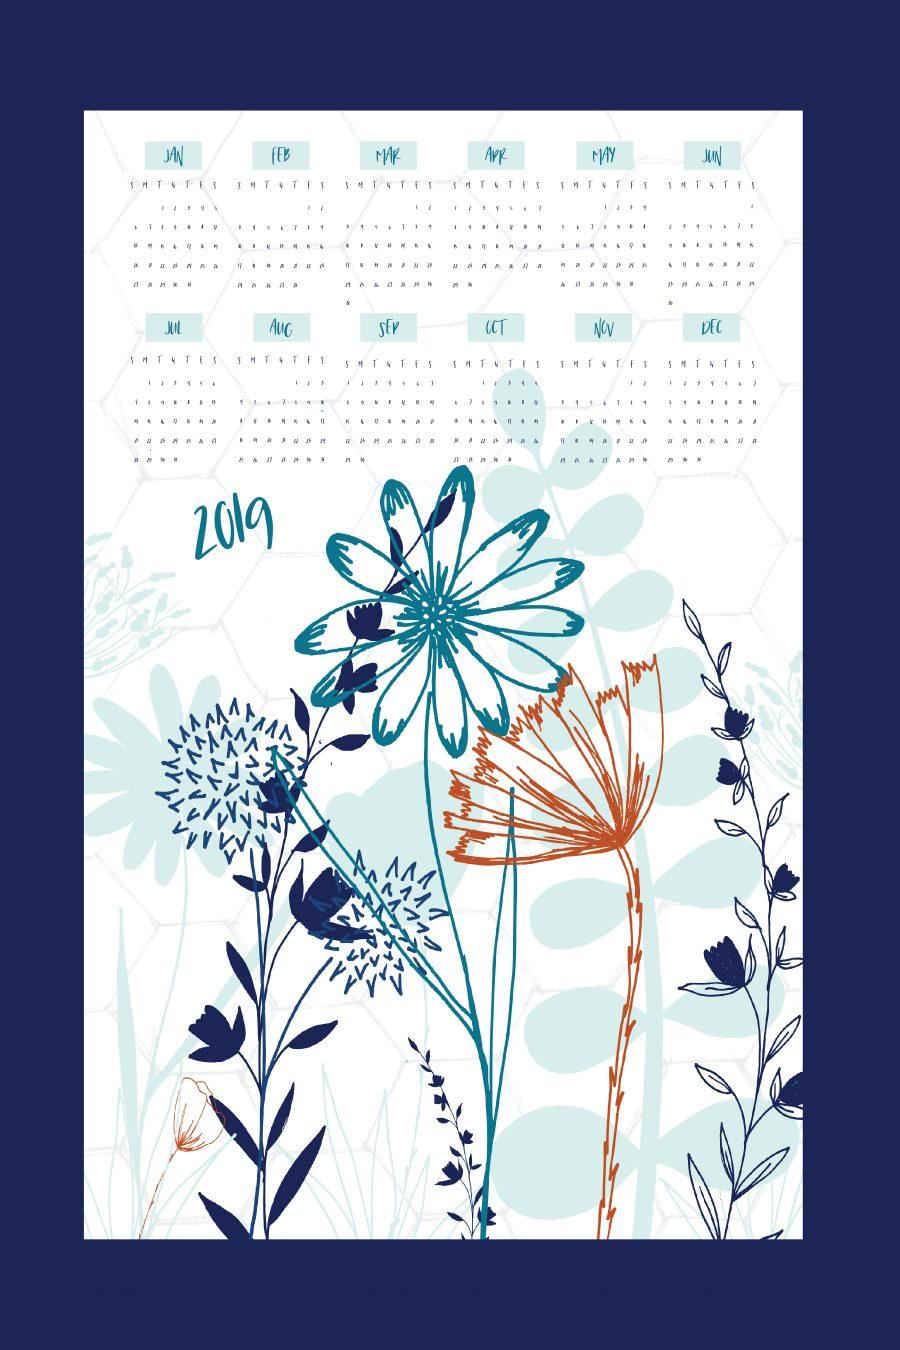 2019 Wildflower Tea Towel Calendar   Radiant Home Studio